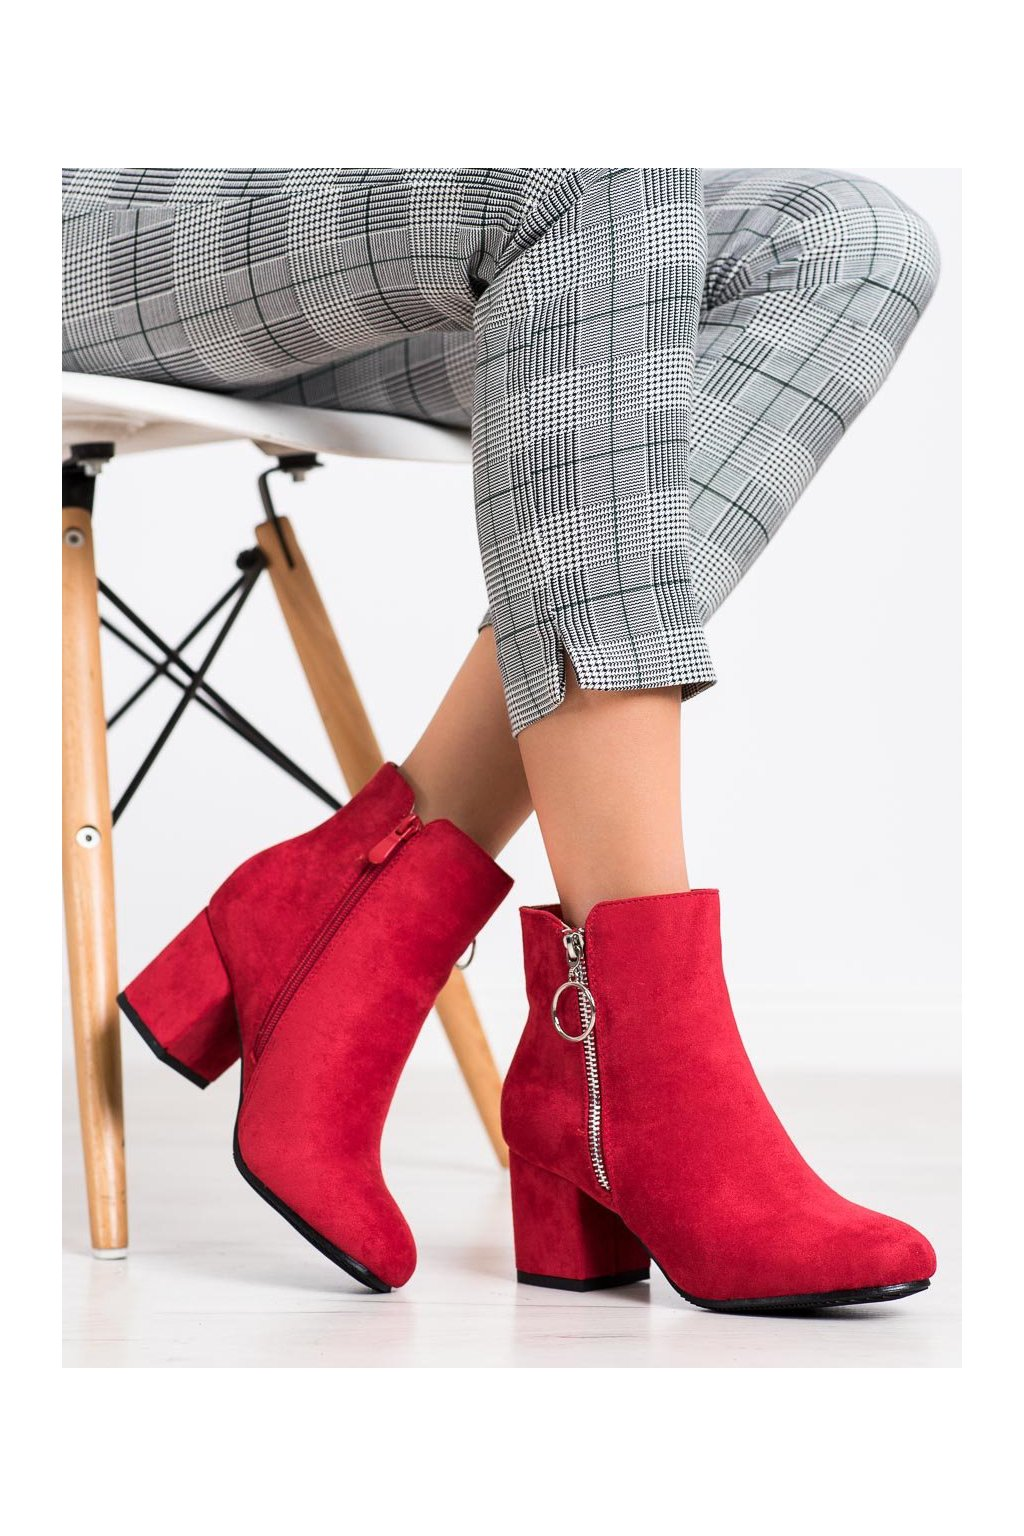 Červené dámske topánky Queen vivi kod 2208-99R